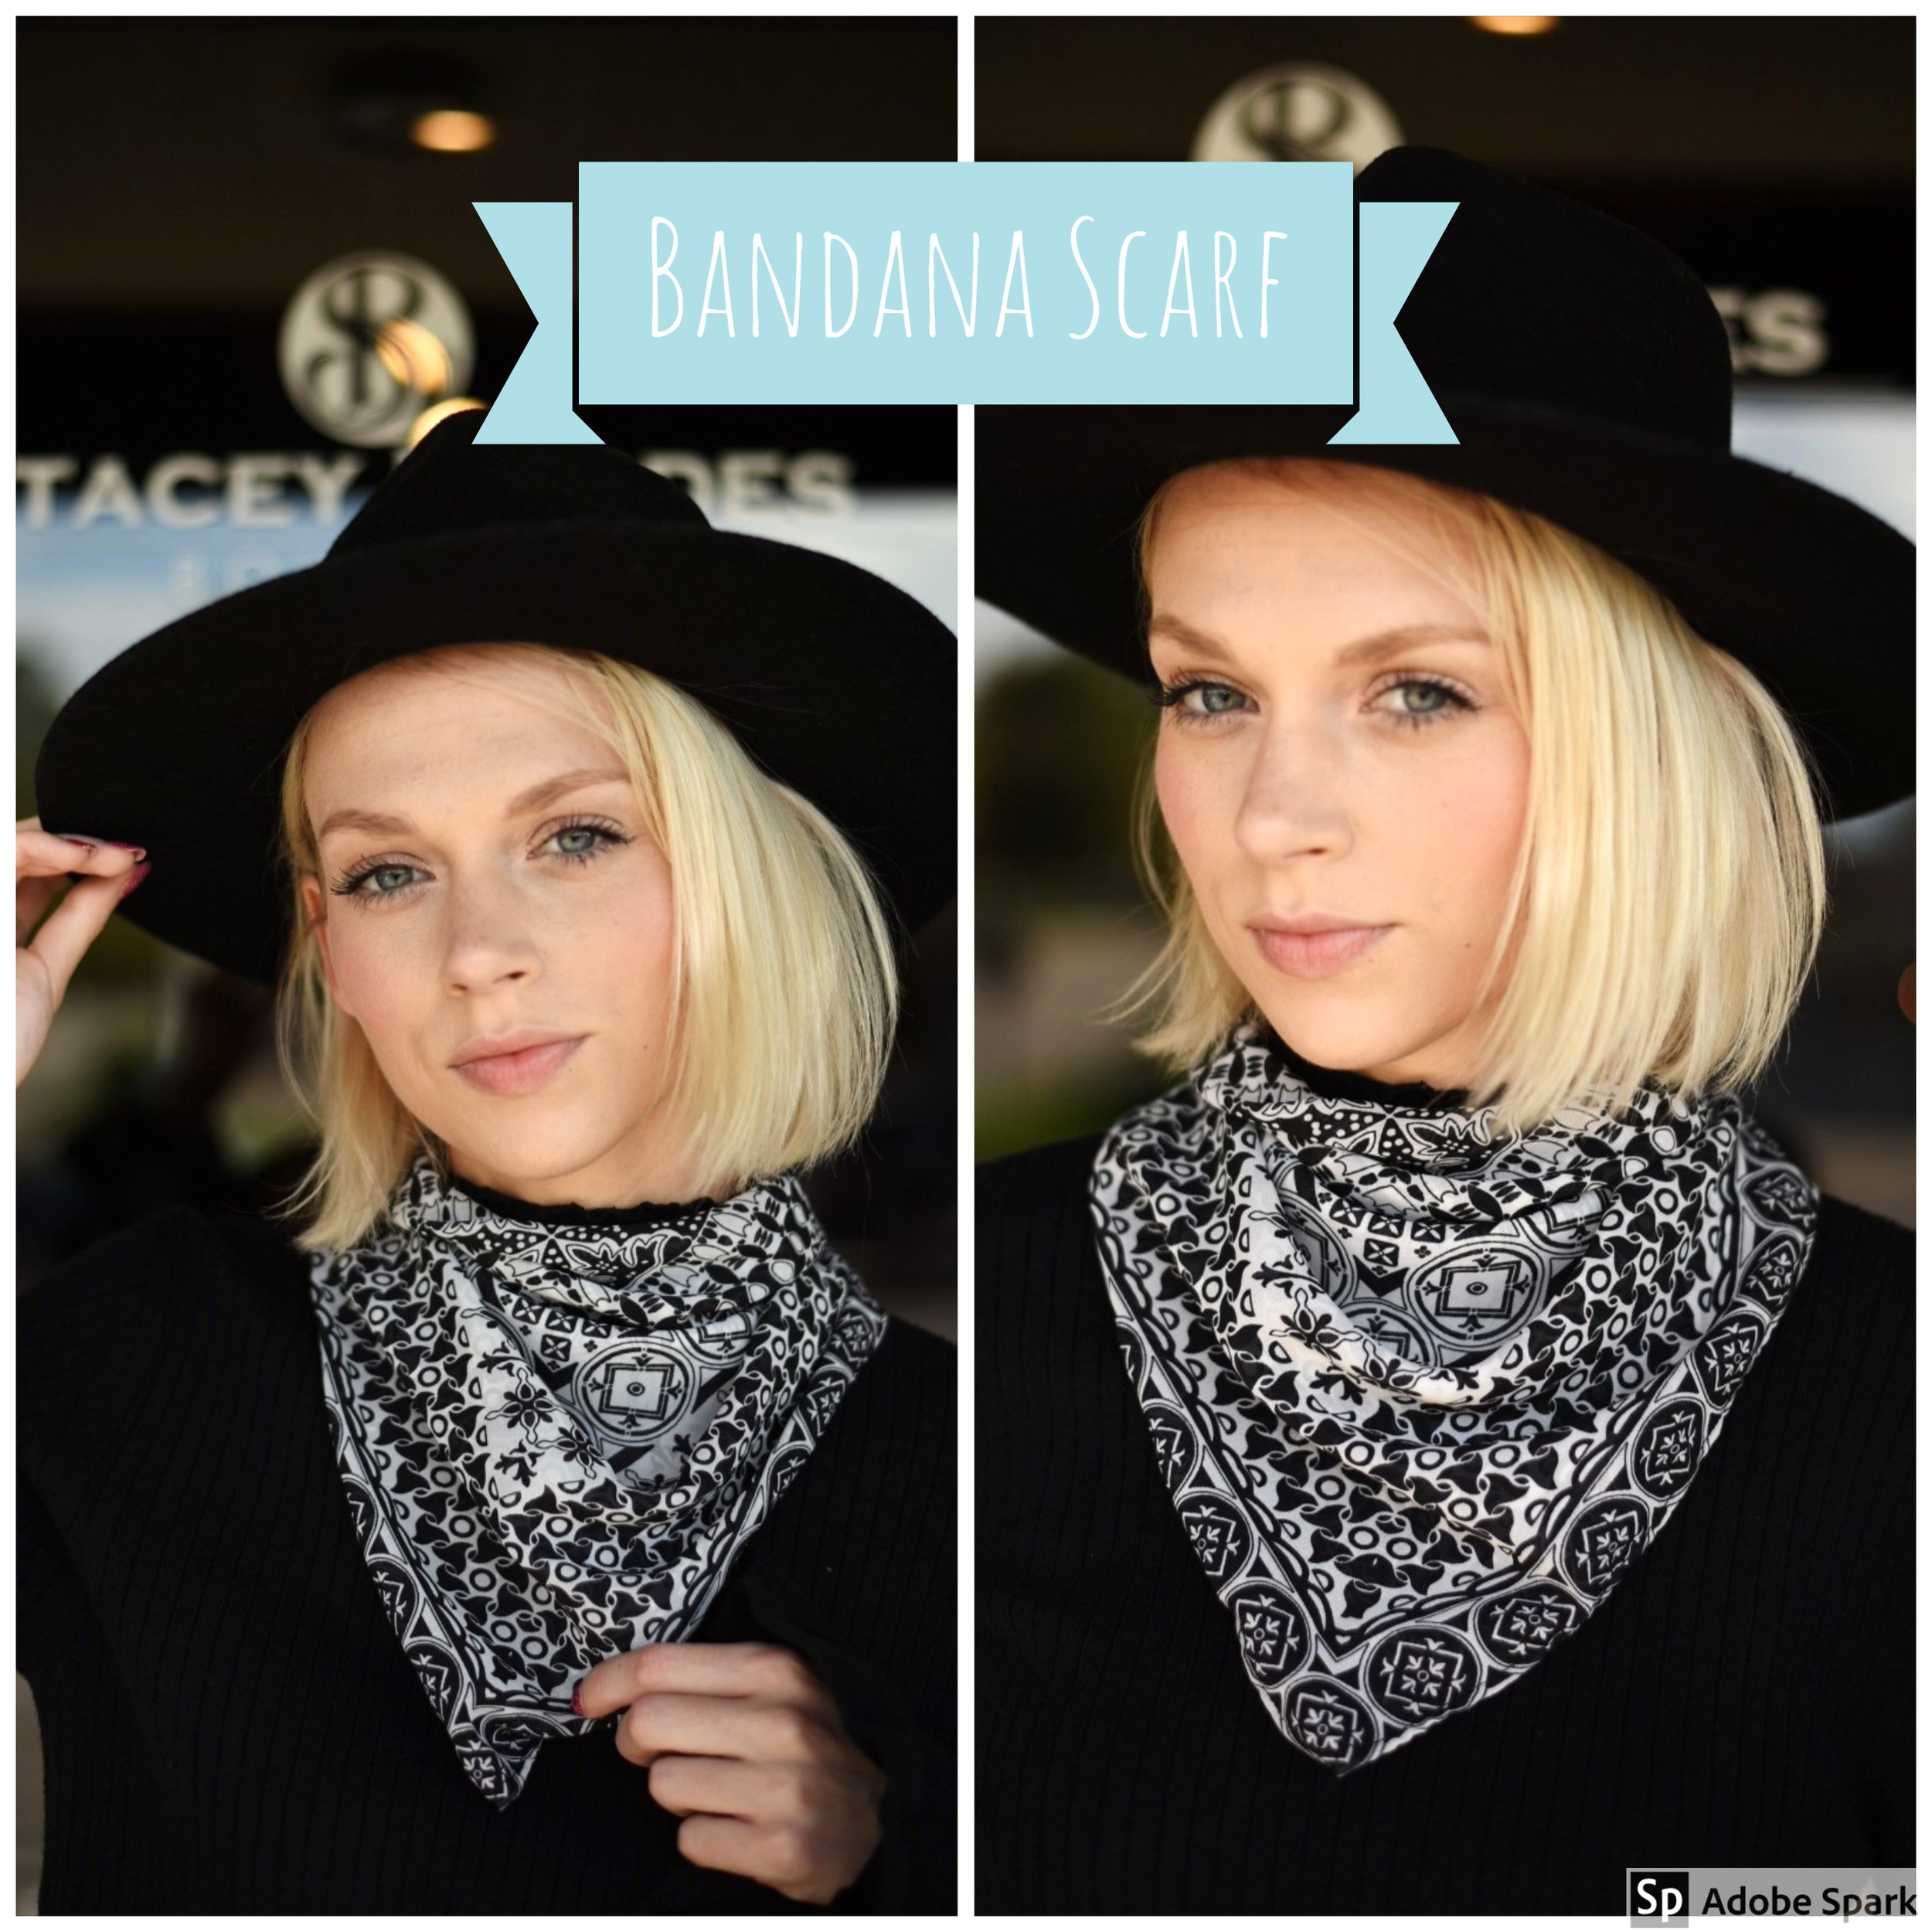 bandana scarf.jpg